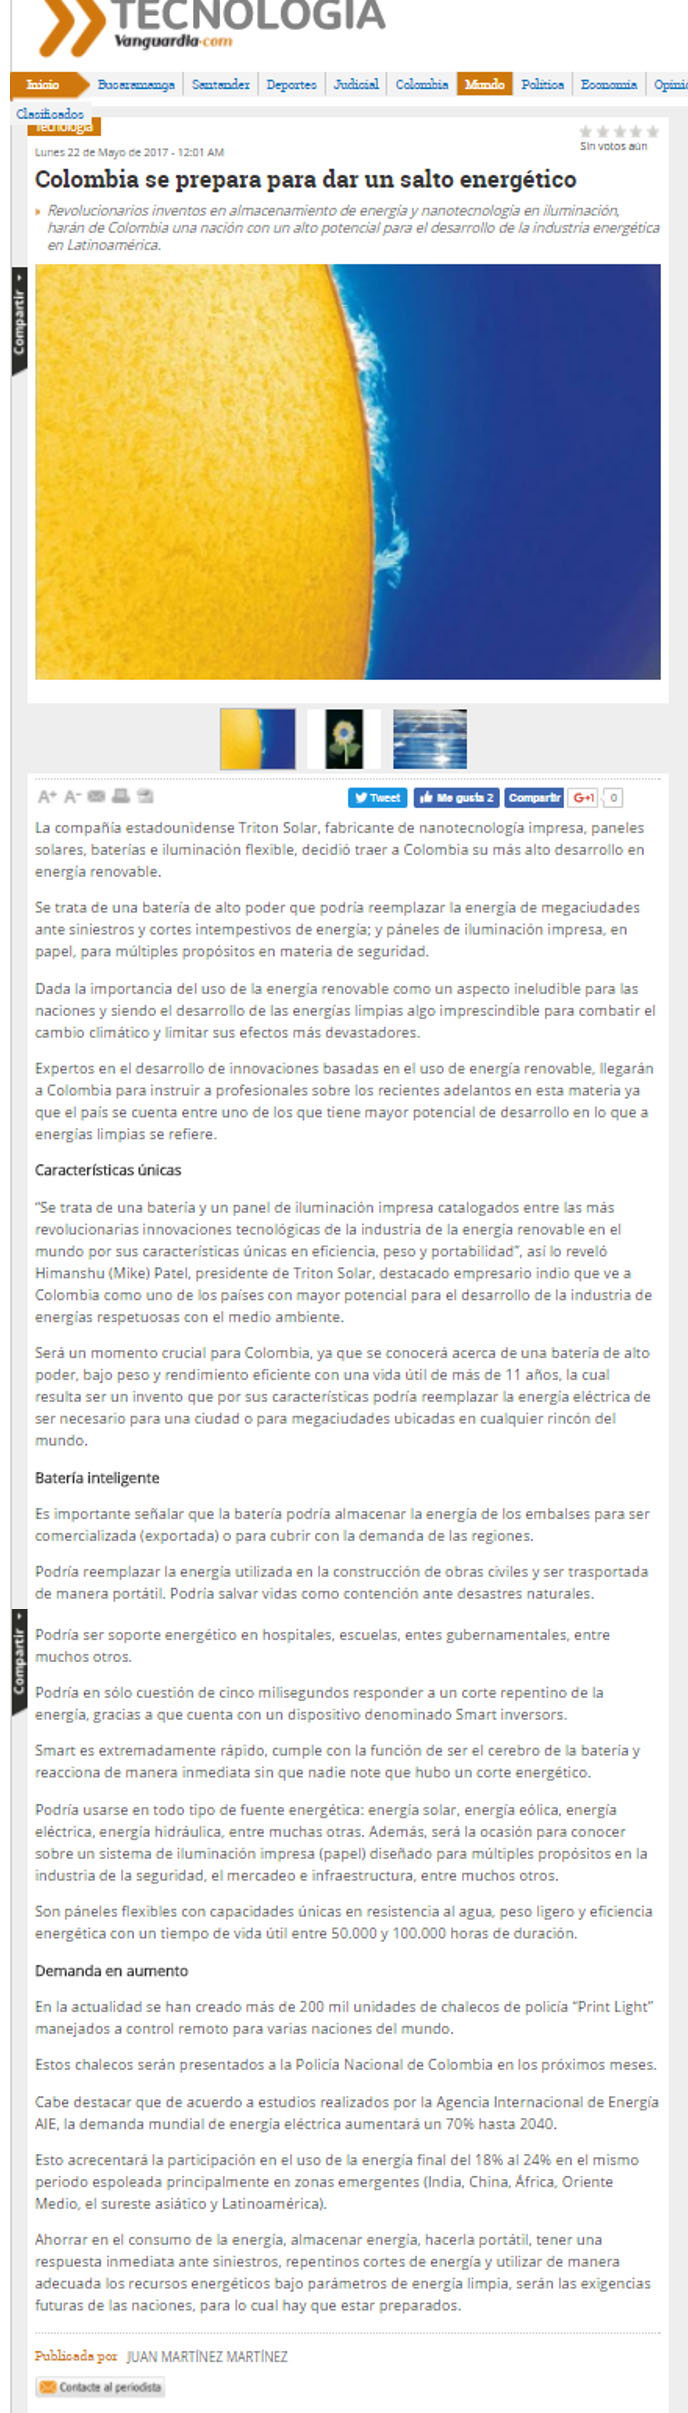 Vanguardia Liberal 22 de mayo